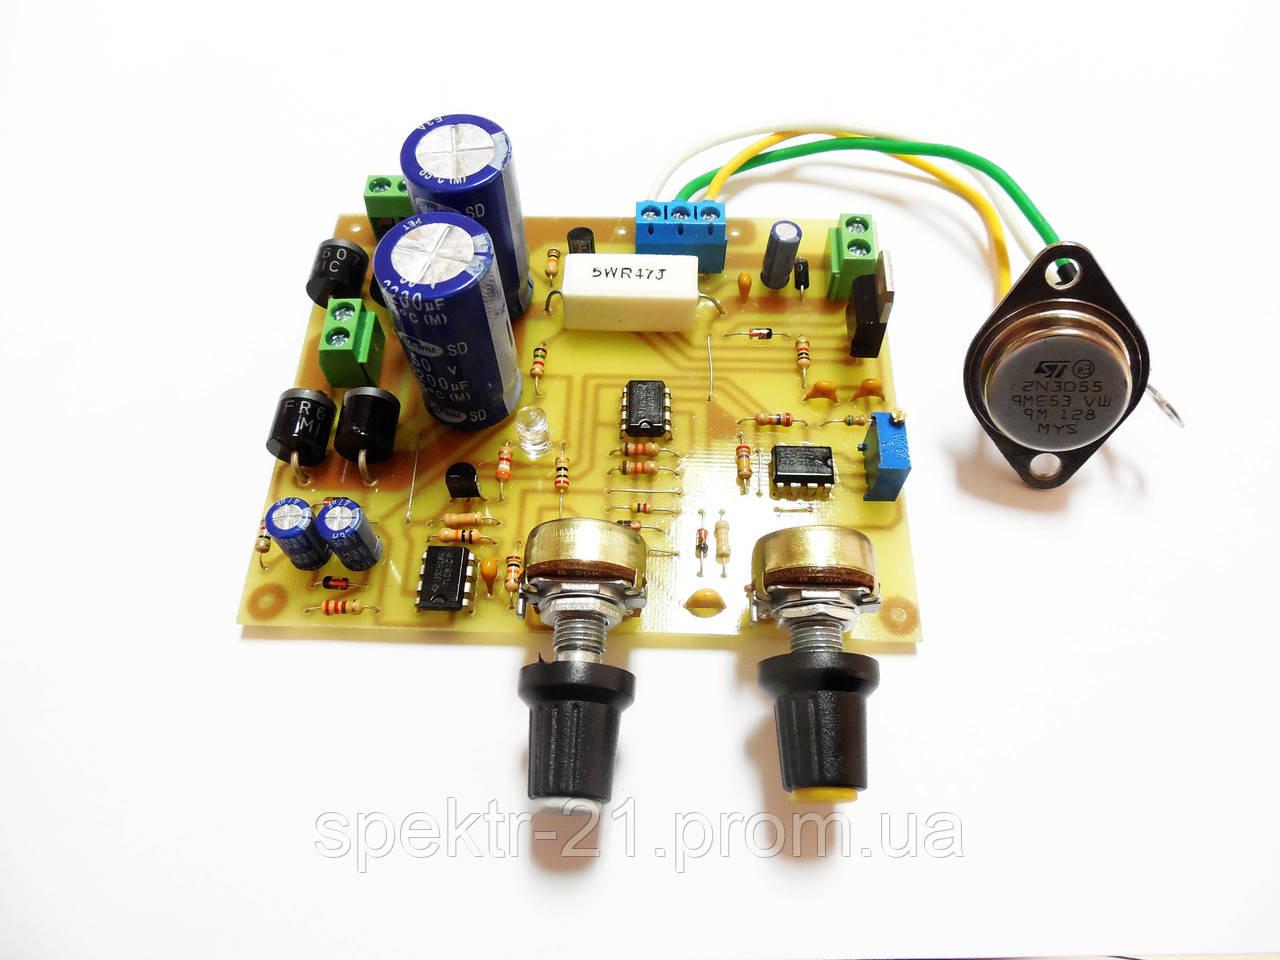 схема блока питания на транзисторе 2n3055